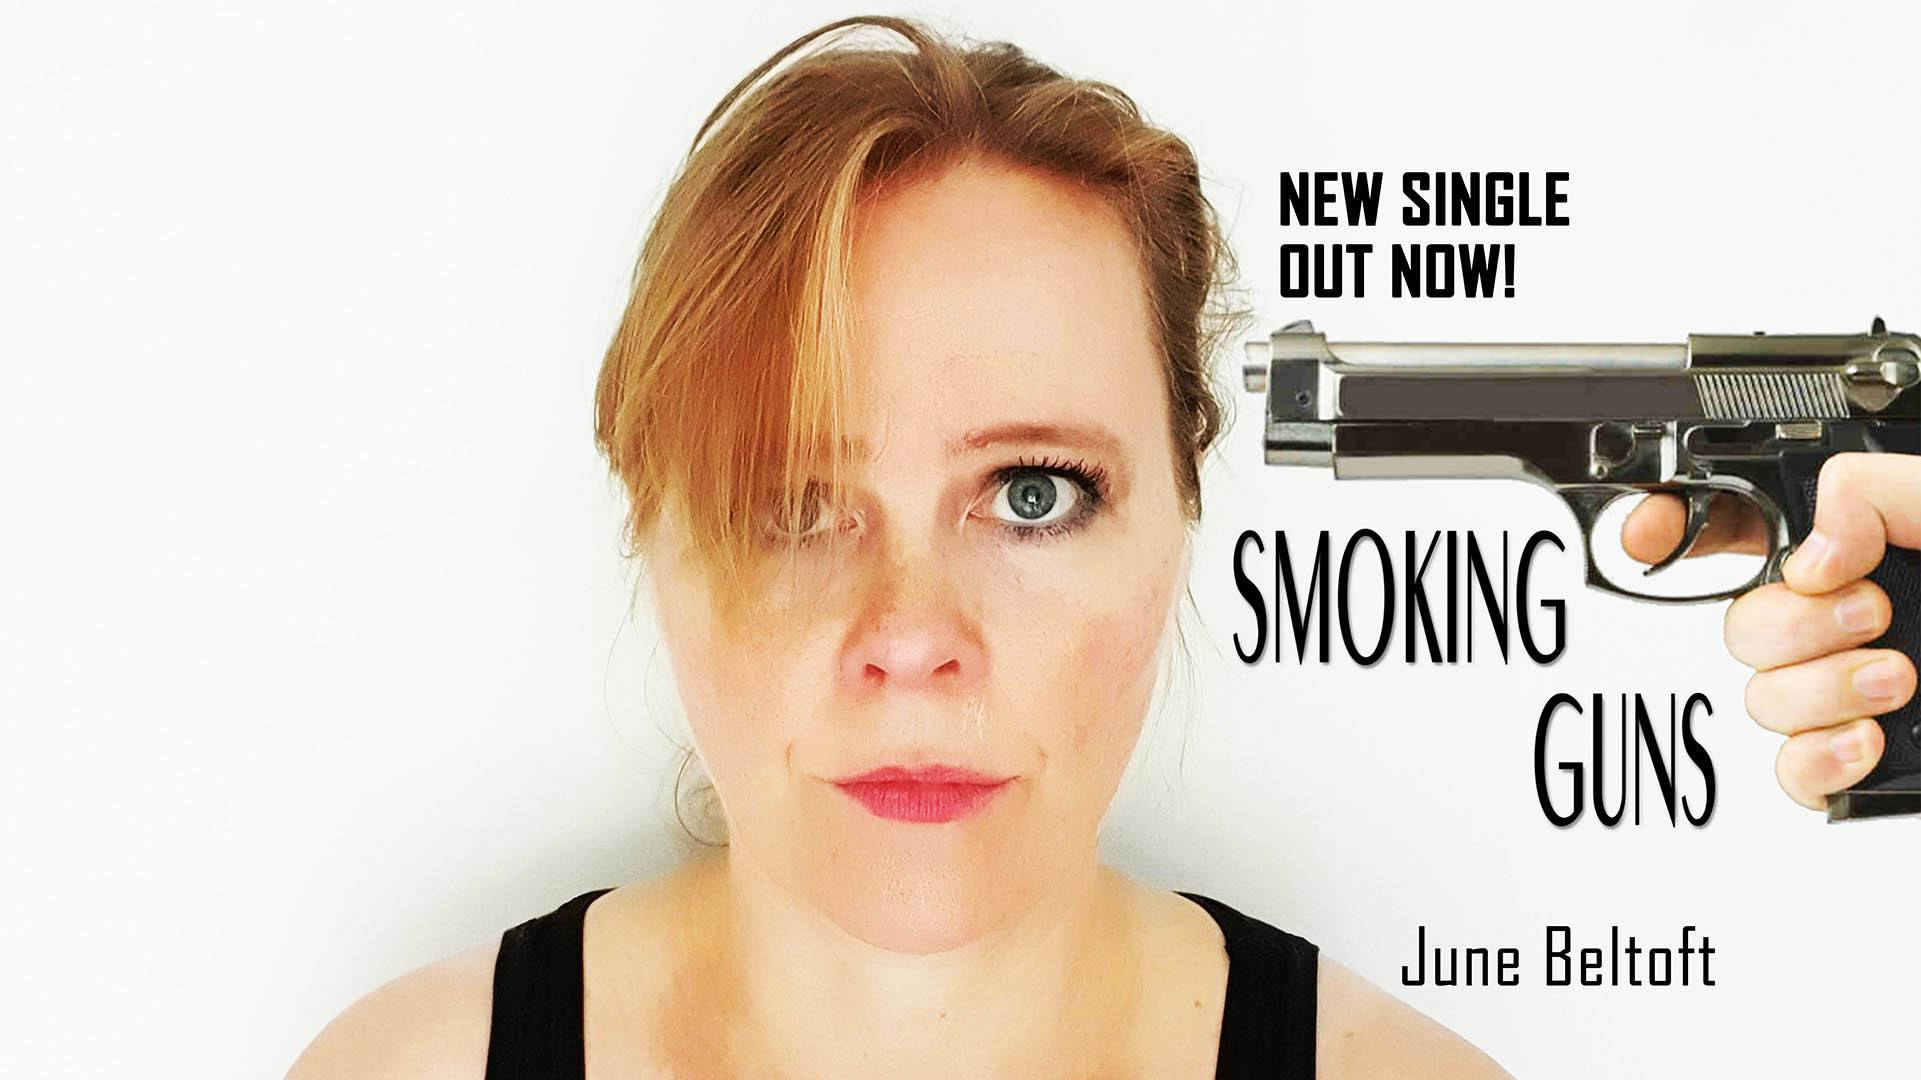 Smoking Guns - new single by June Beltoft